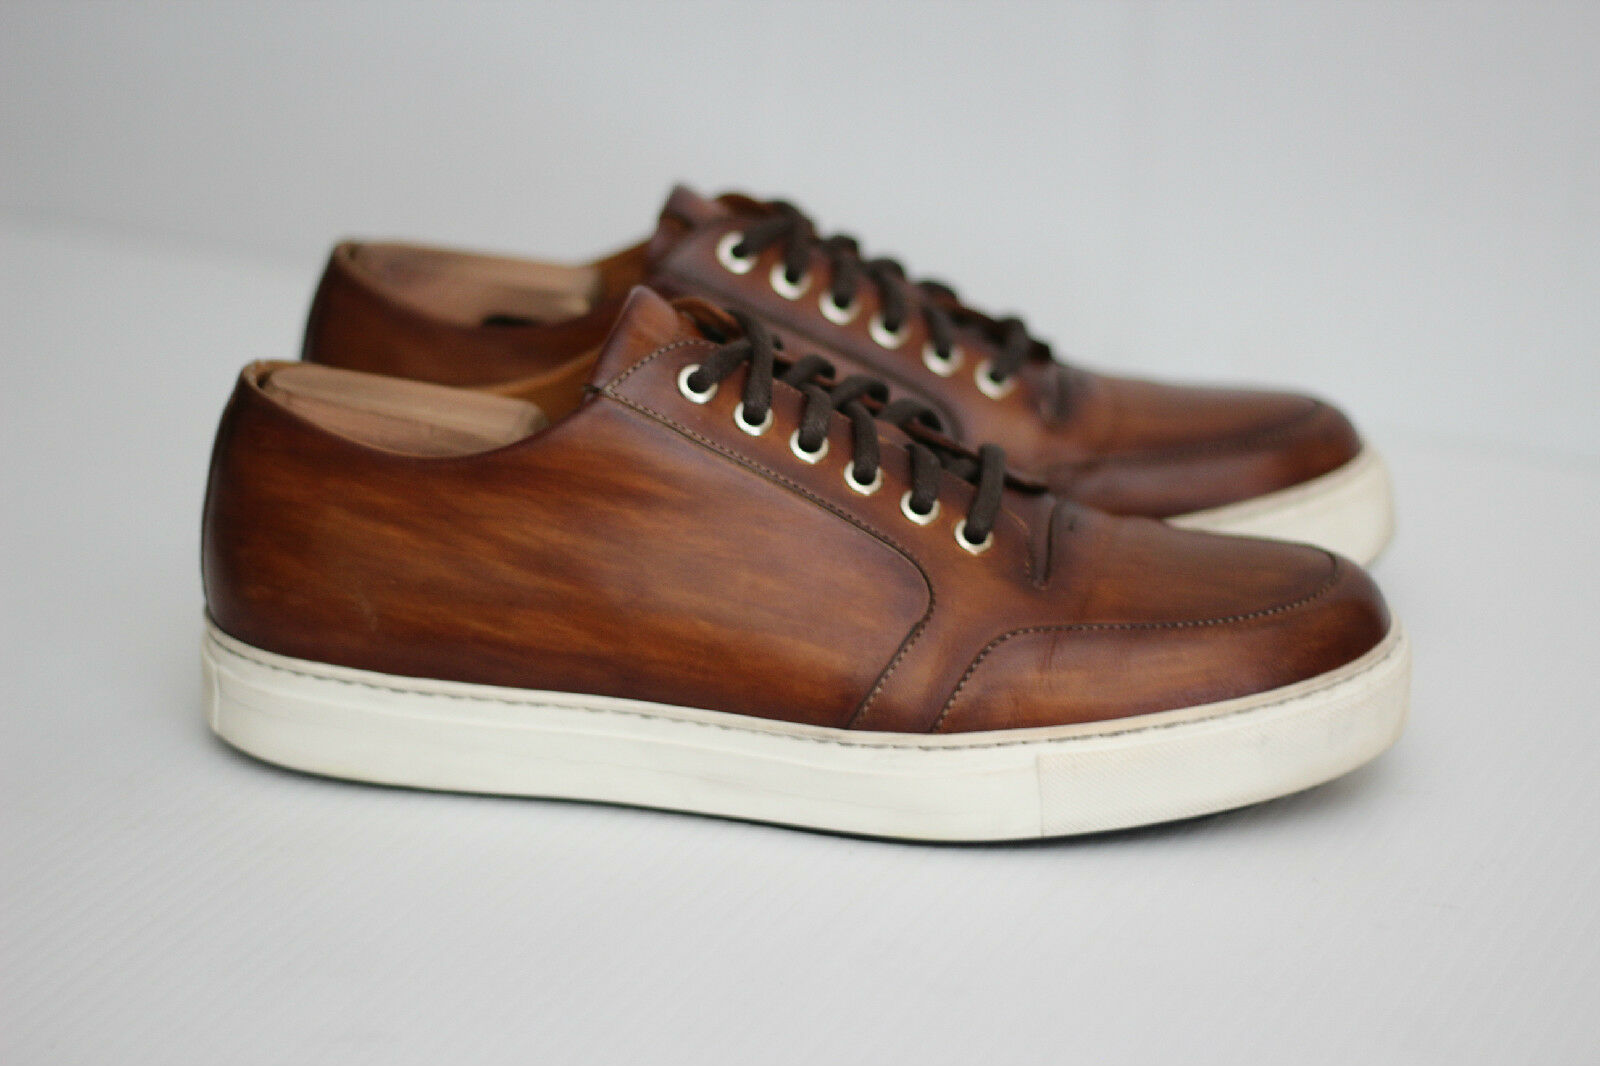 Magnanni 'Roberto'  Cuero Up Brown Pelle Lace Up Cuero Shoes 10 M (W93) 3e488a